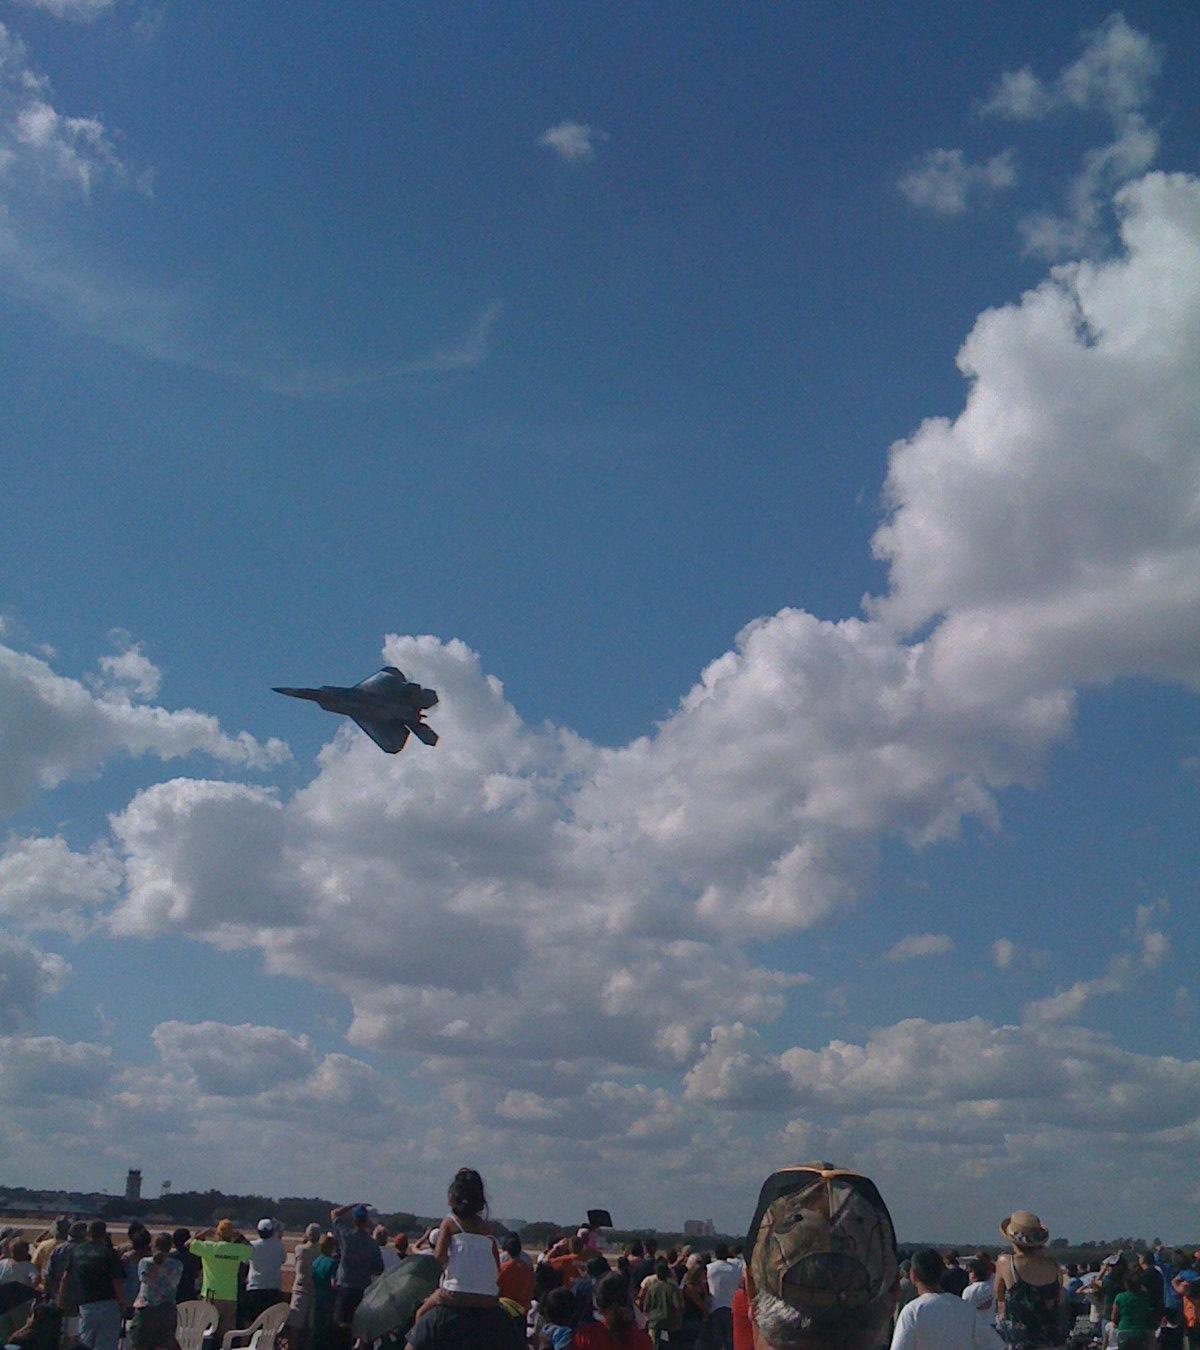 F-22 Raptor, Baby!